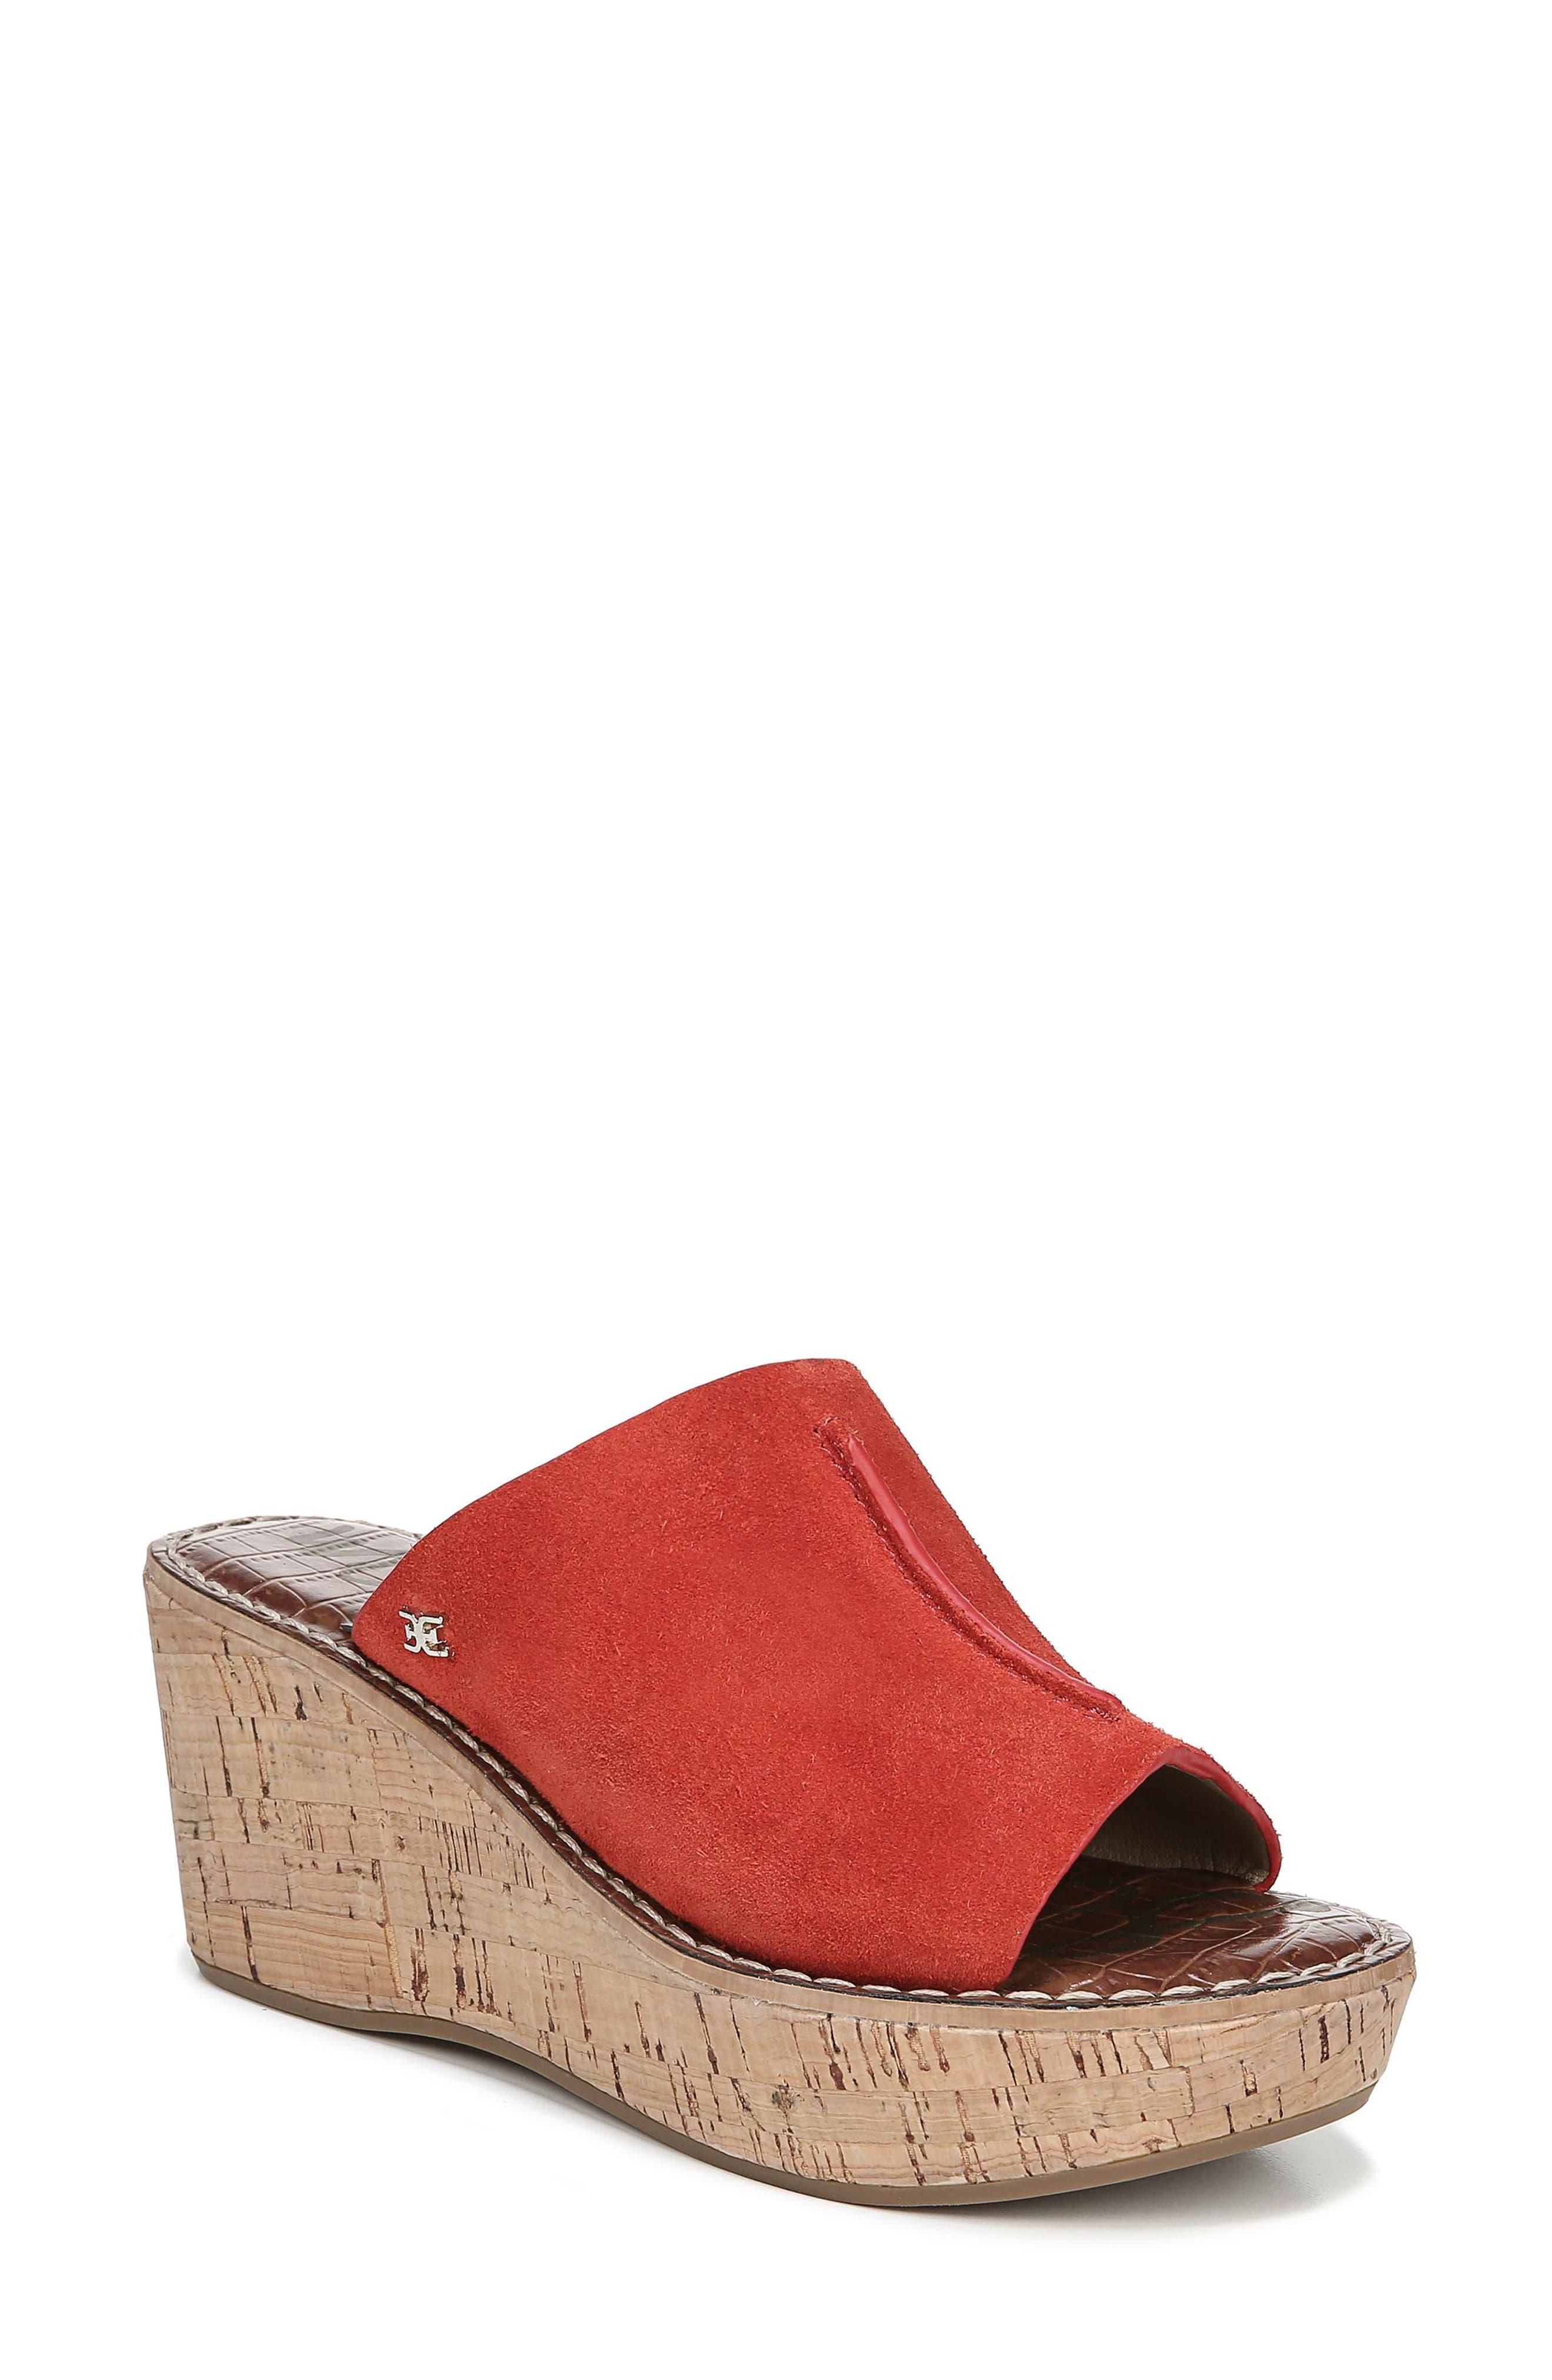 Ranger Platform Sandal,                             Main thumbnail 1, color,                             CANDY RED SUEDE